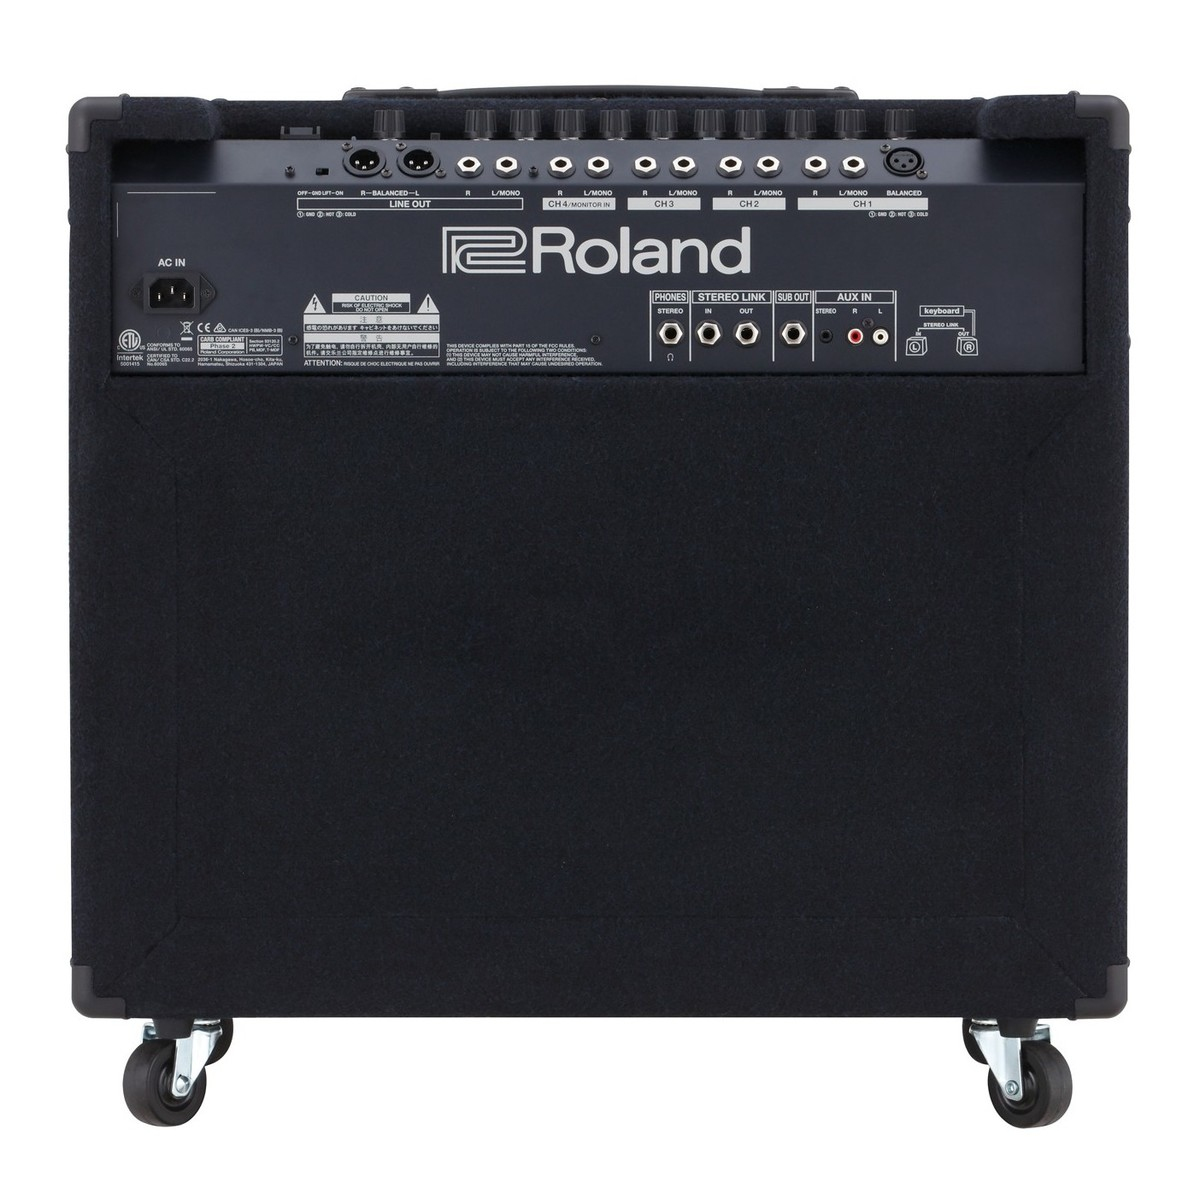 roland kc 600 keyboard amplifier at gear4music. Black Bedroom Furniture Sets. Home Design Ideas